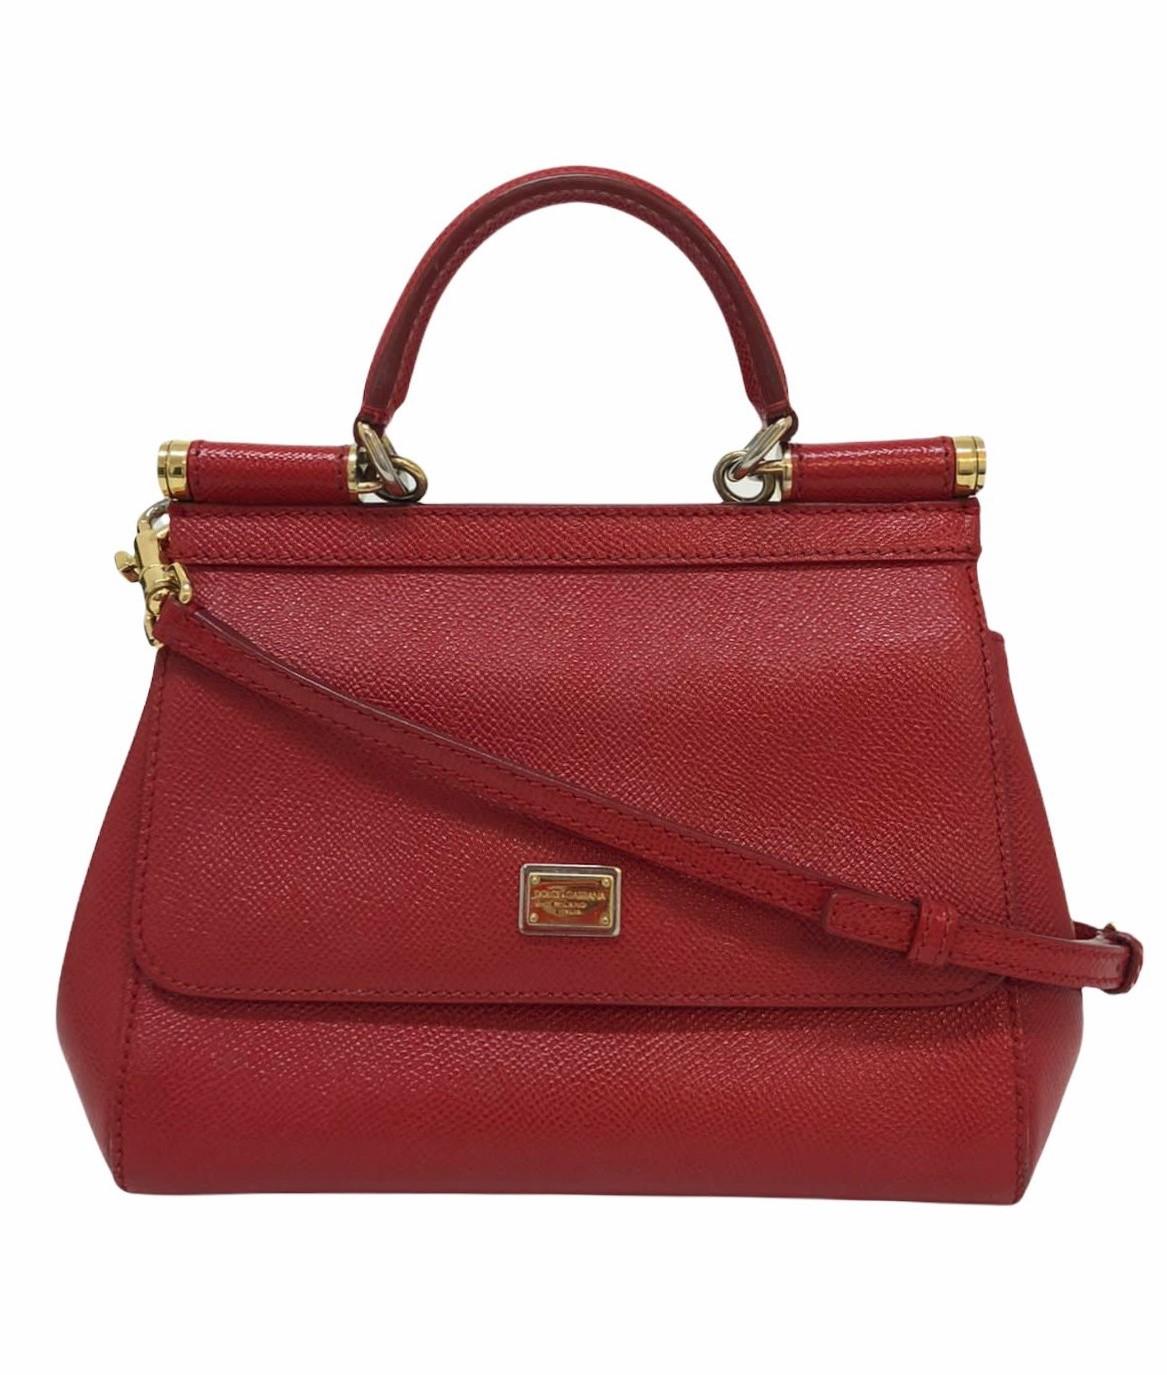 Bolsa Dolce & Gabbana Miss Sicily Small Vermelha